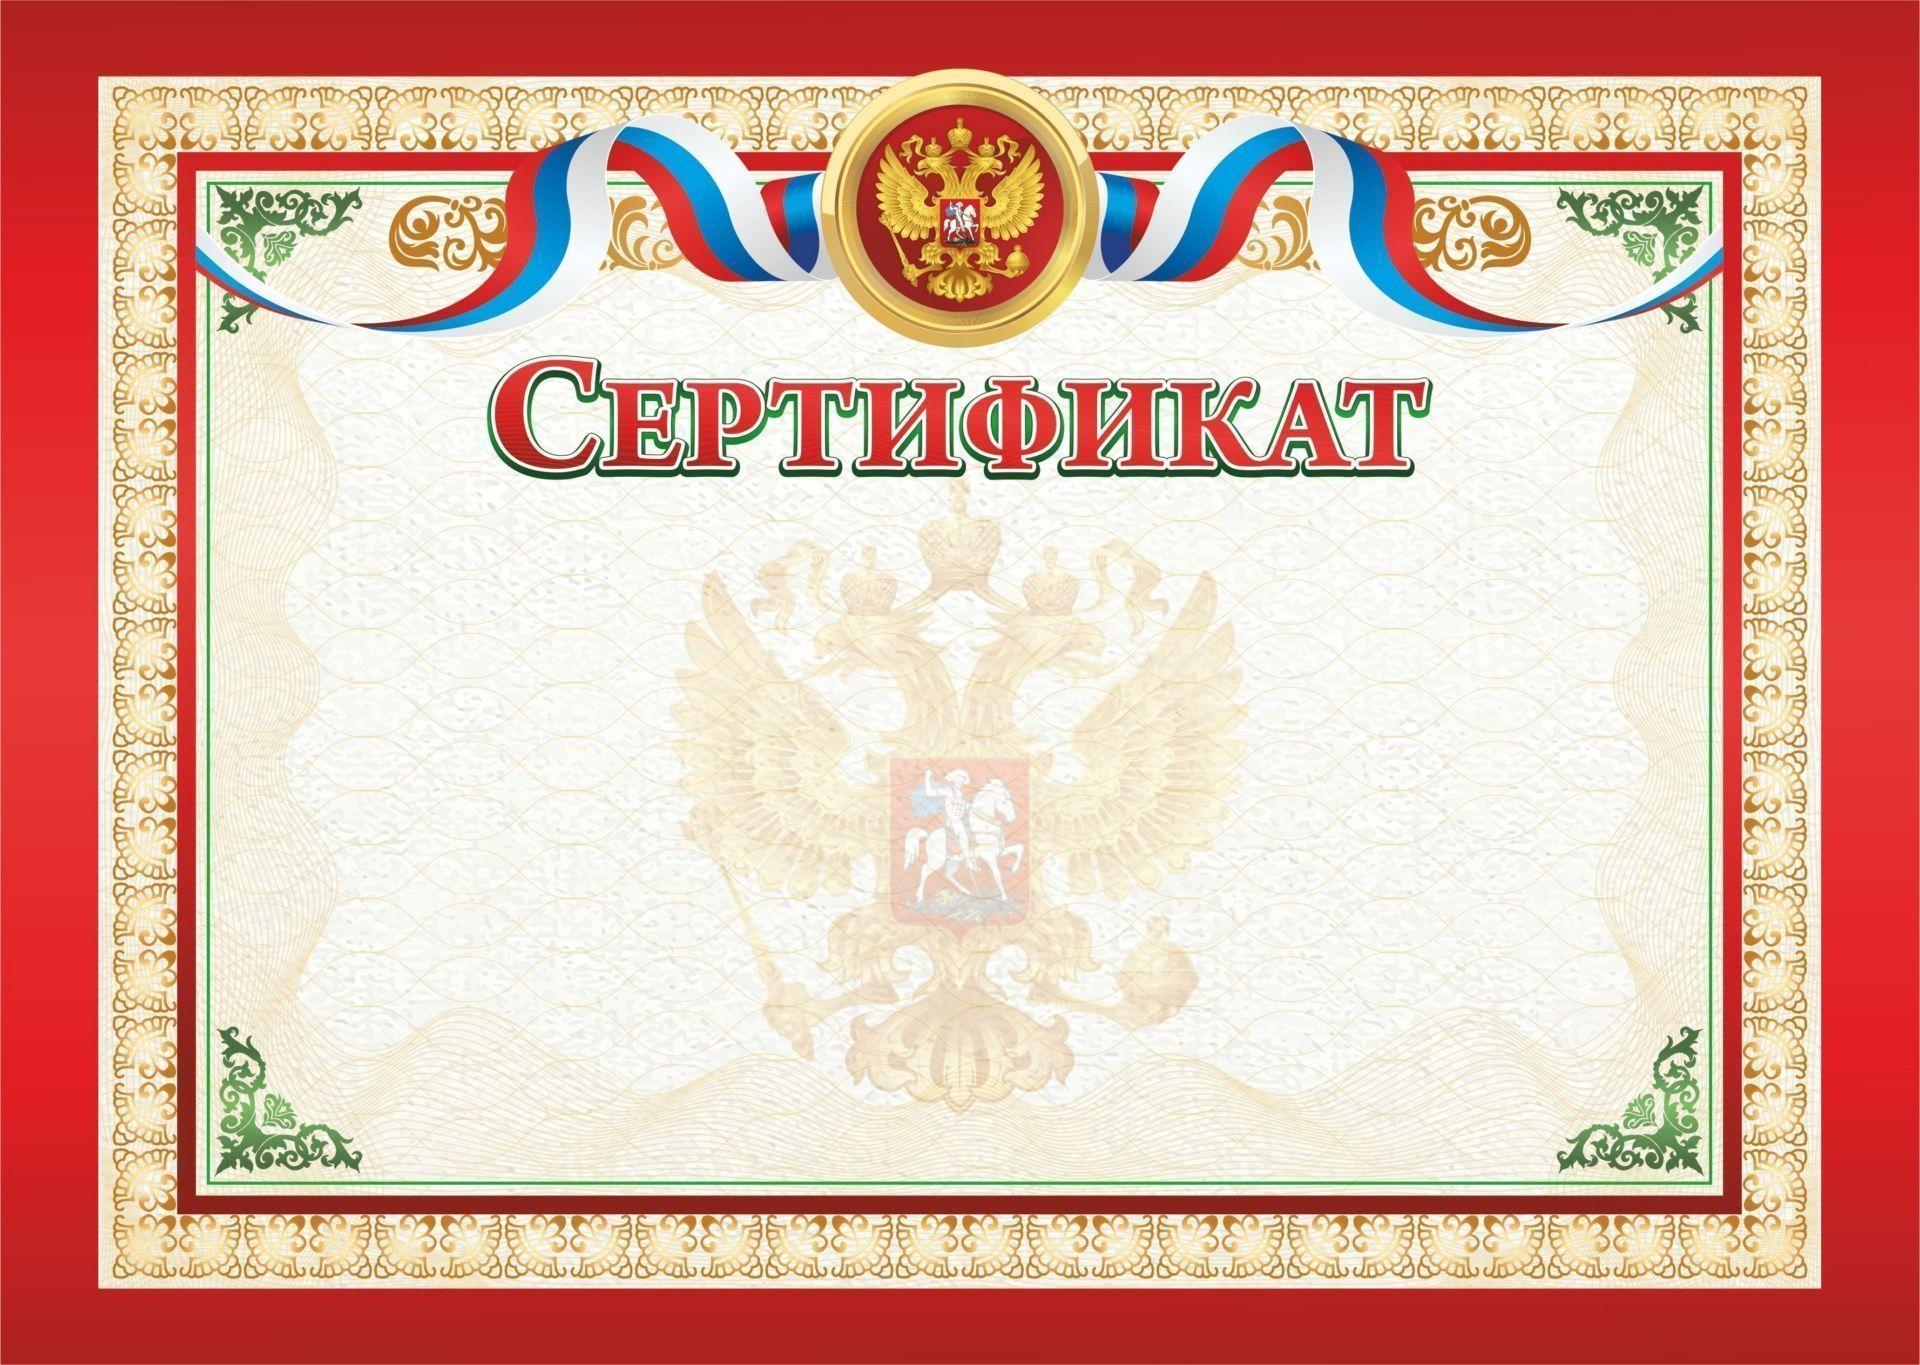 Сертификат образец 3 фото